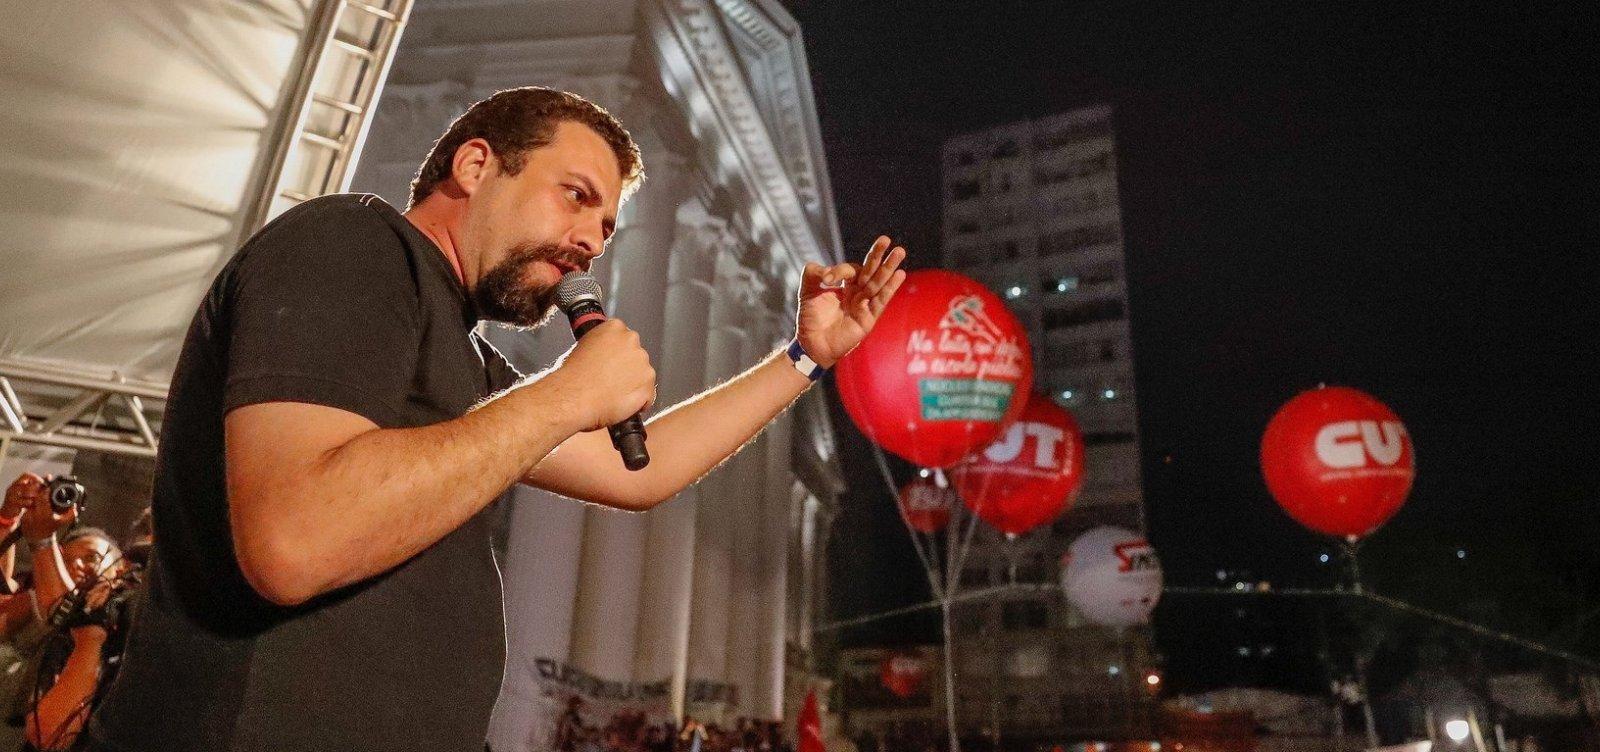 Revista Time elege Guilherme Boulos e Anitta entre os 100 líderes do futuro